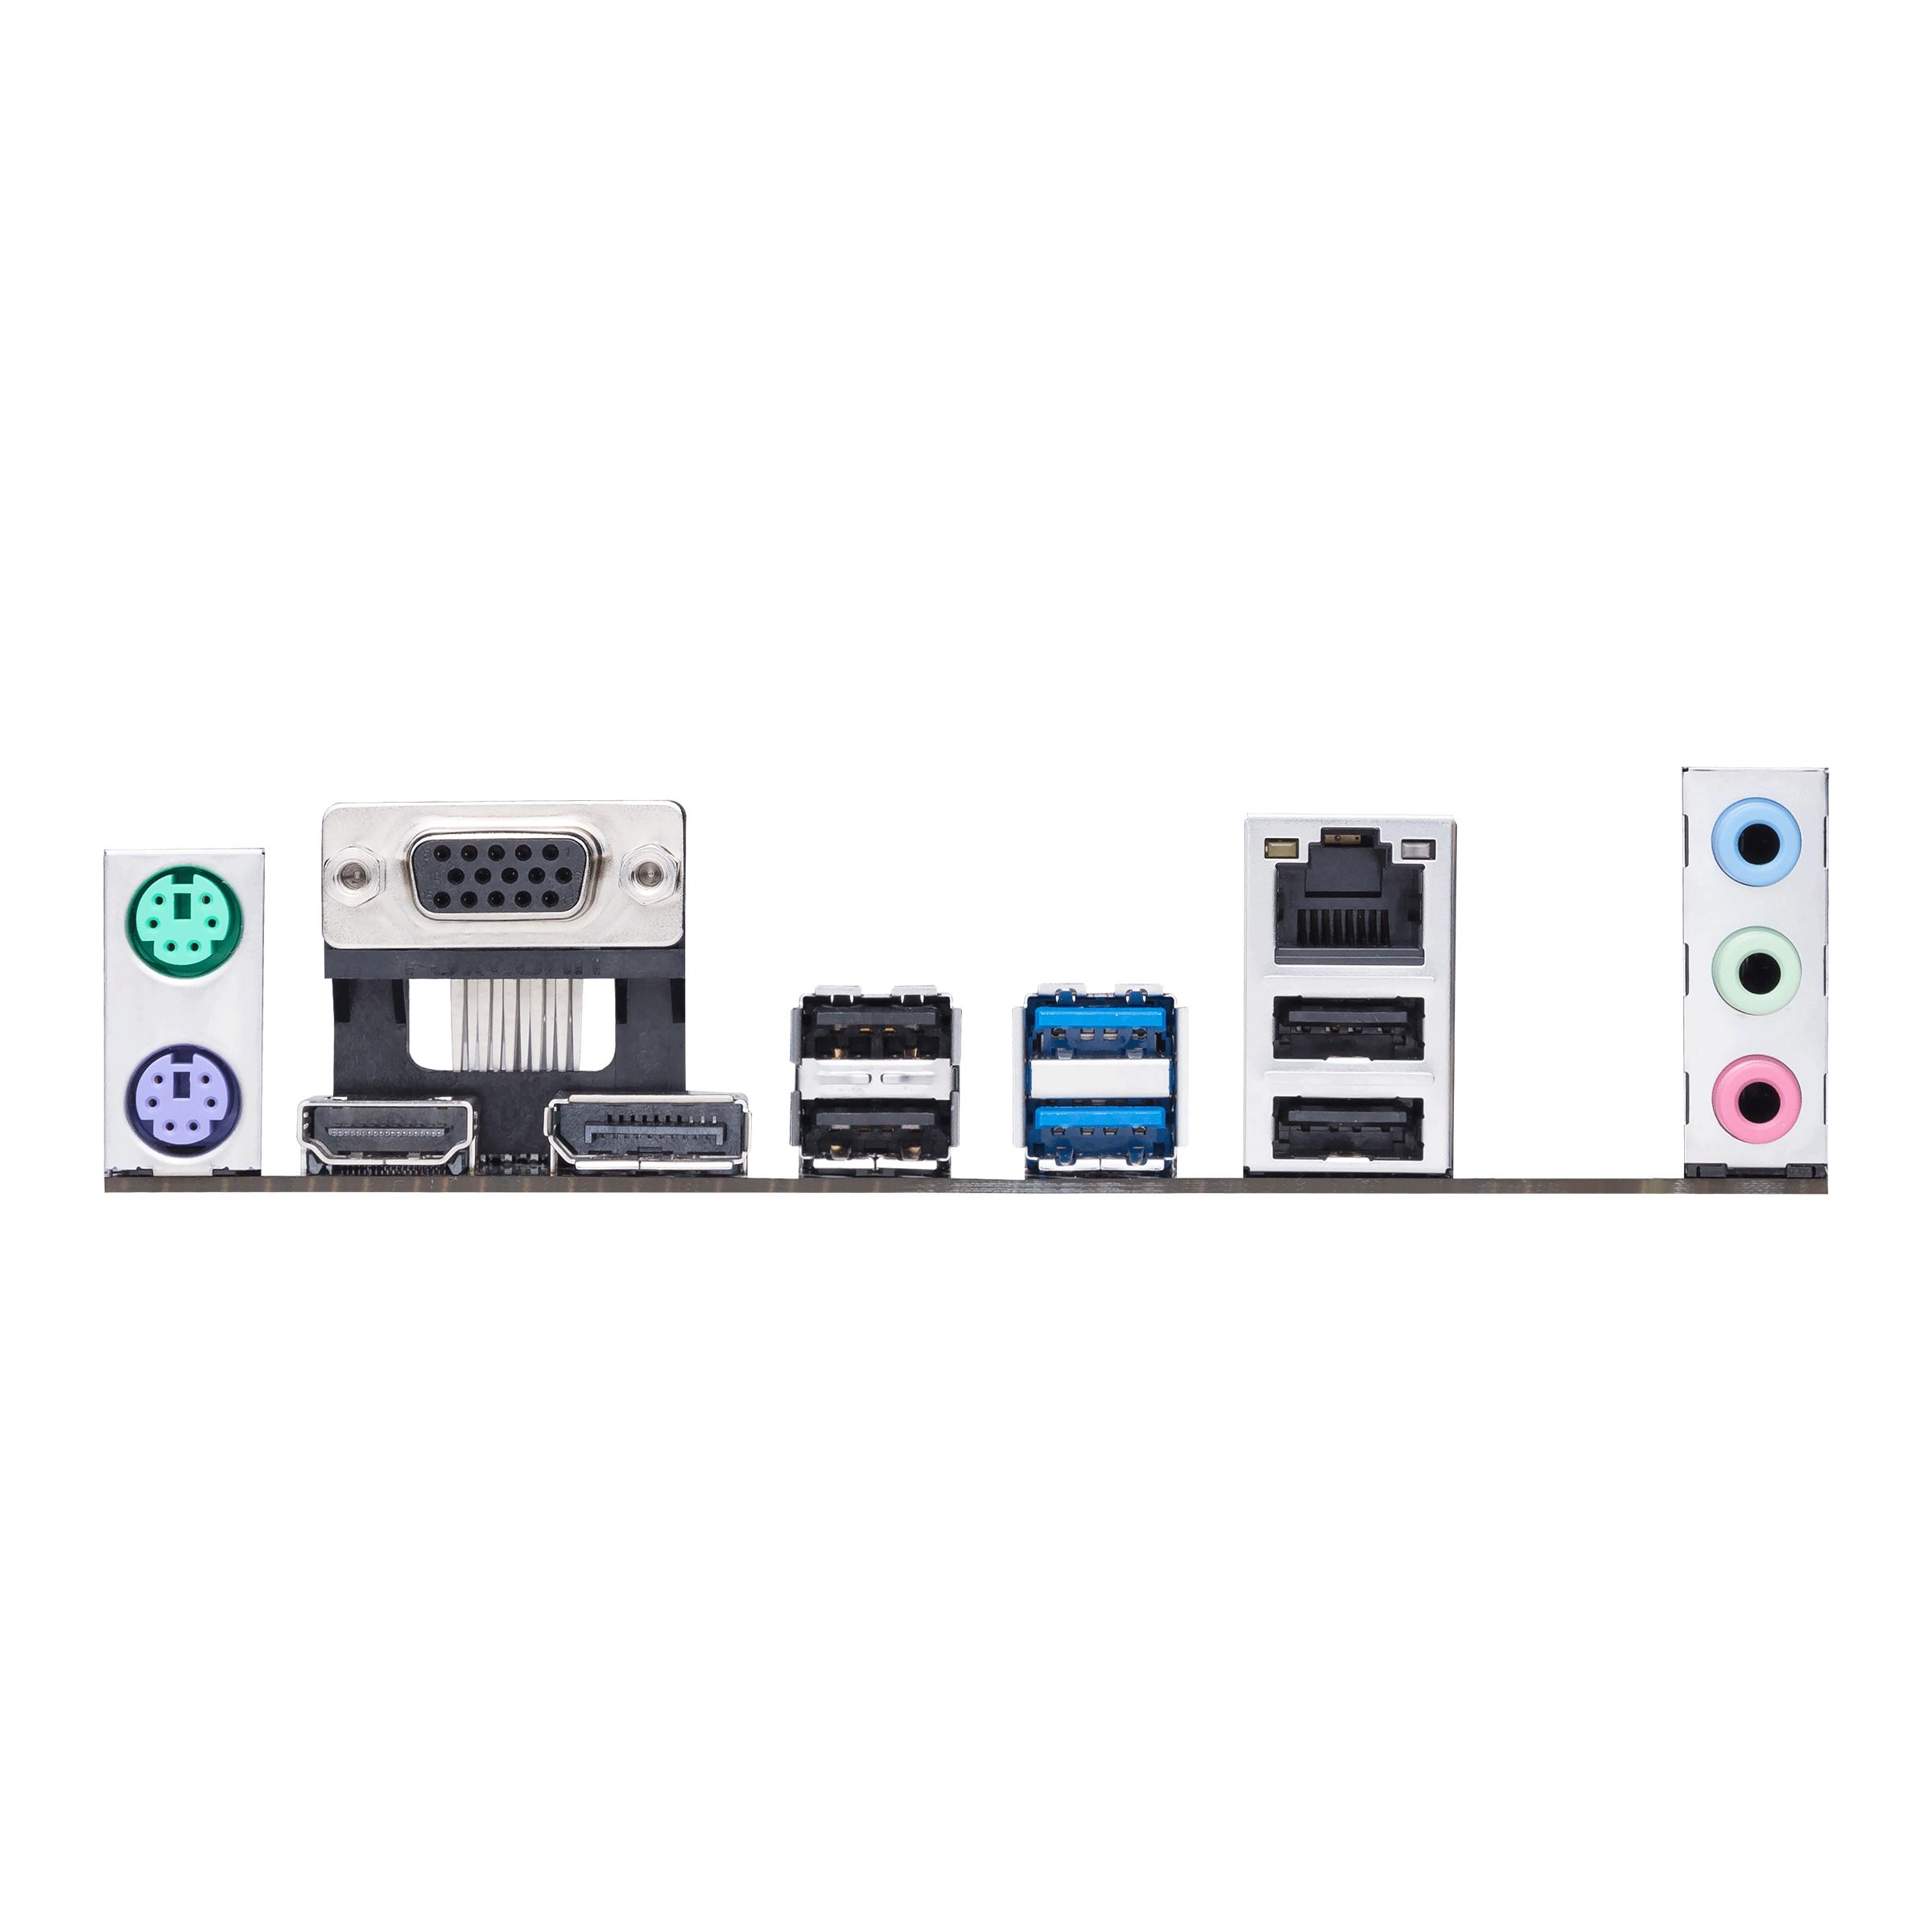 ASUS PRIME H510M-A - Motherboard - micro ATX - LGA1200-Sockel - H510 - USB 3.2 Gen 1 - Gigabit LAN - Onboard-Grafik (CPU erforderlich)